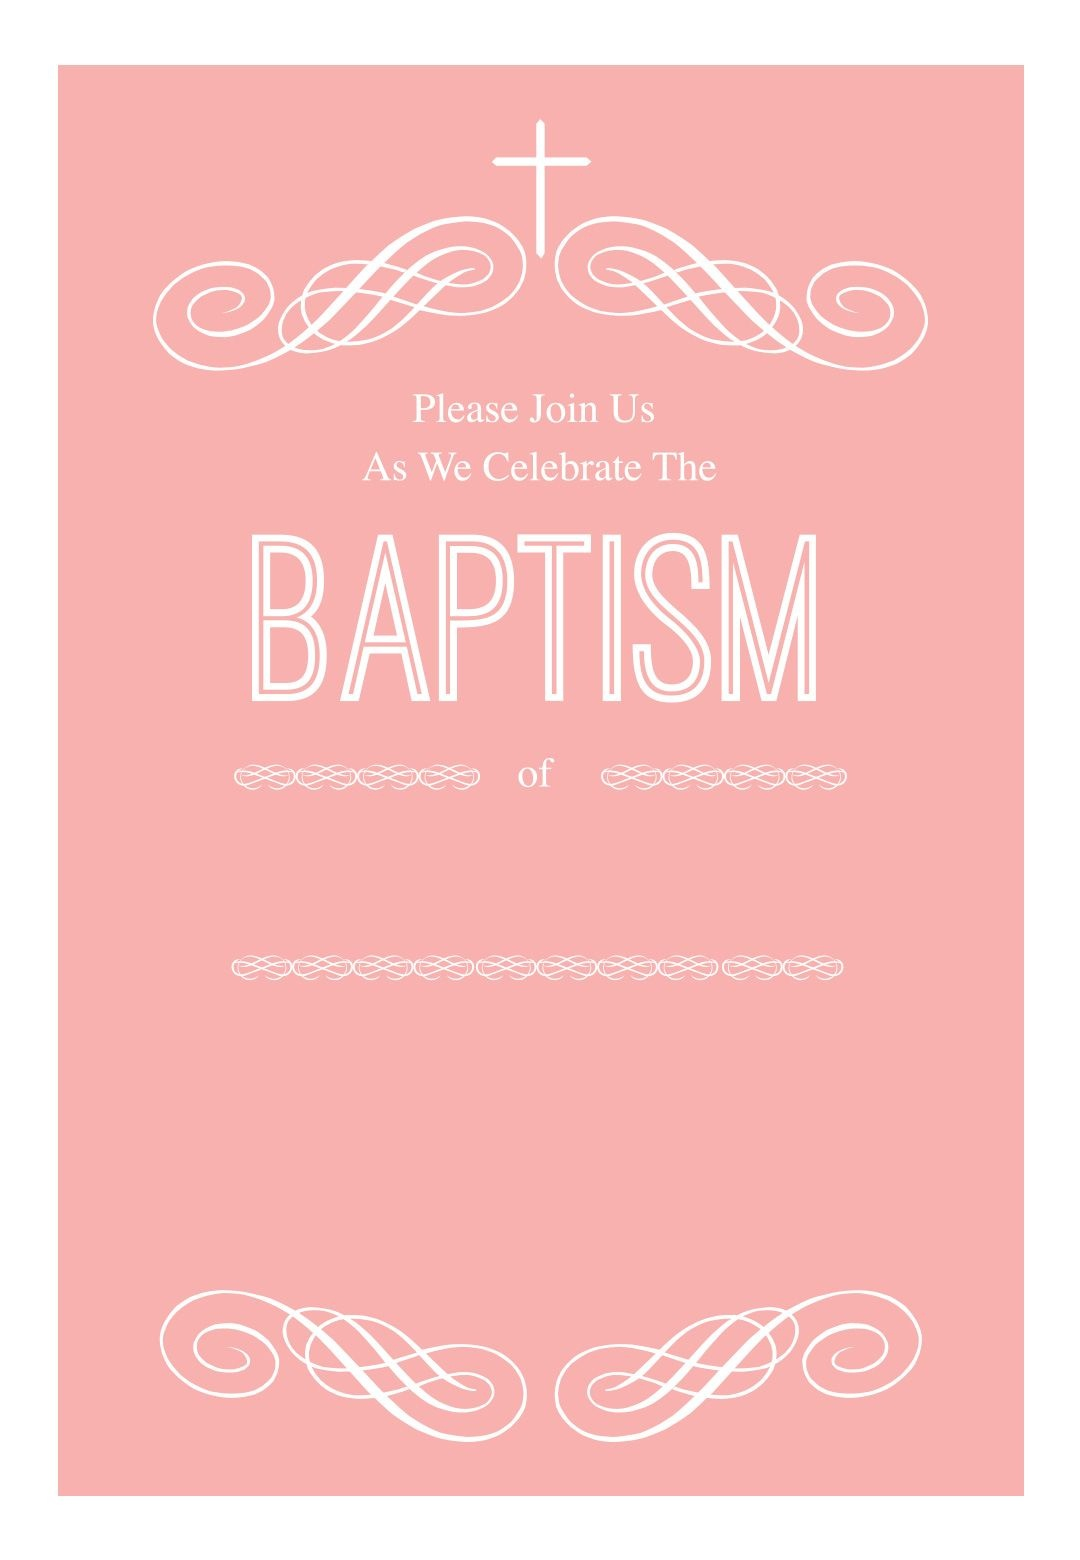 Pink Decorations - Free Printable Baptism & Christening Invitation - Free Printable Personalized Baptism Invitations